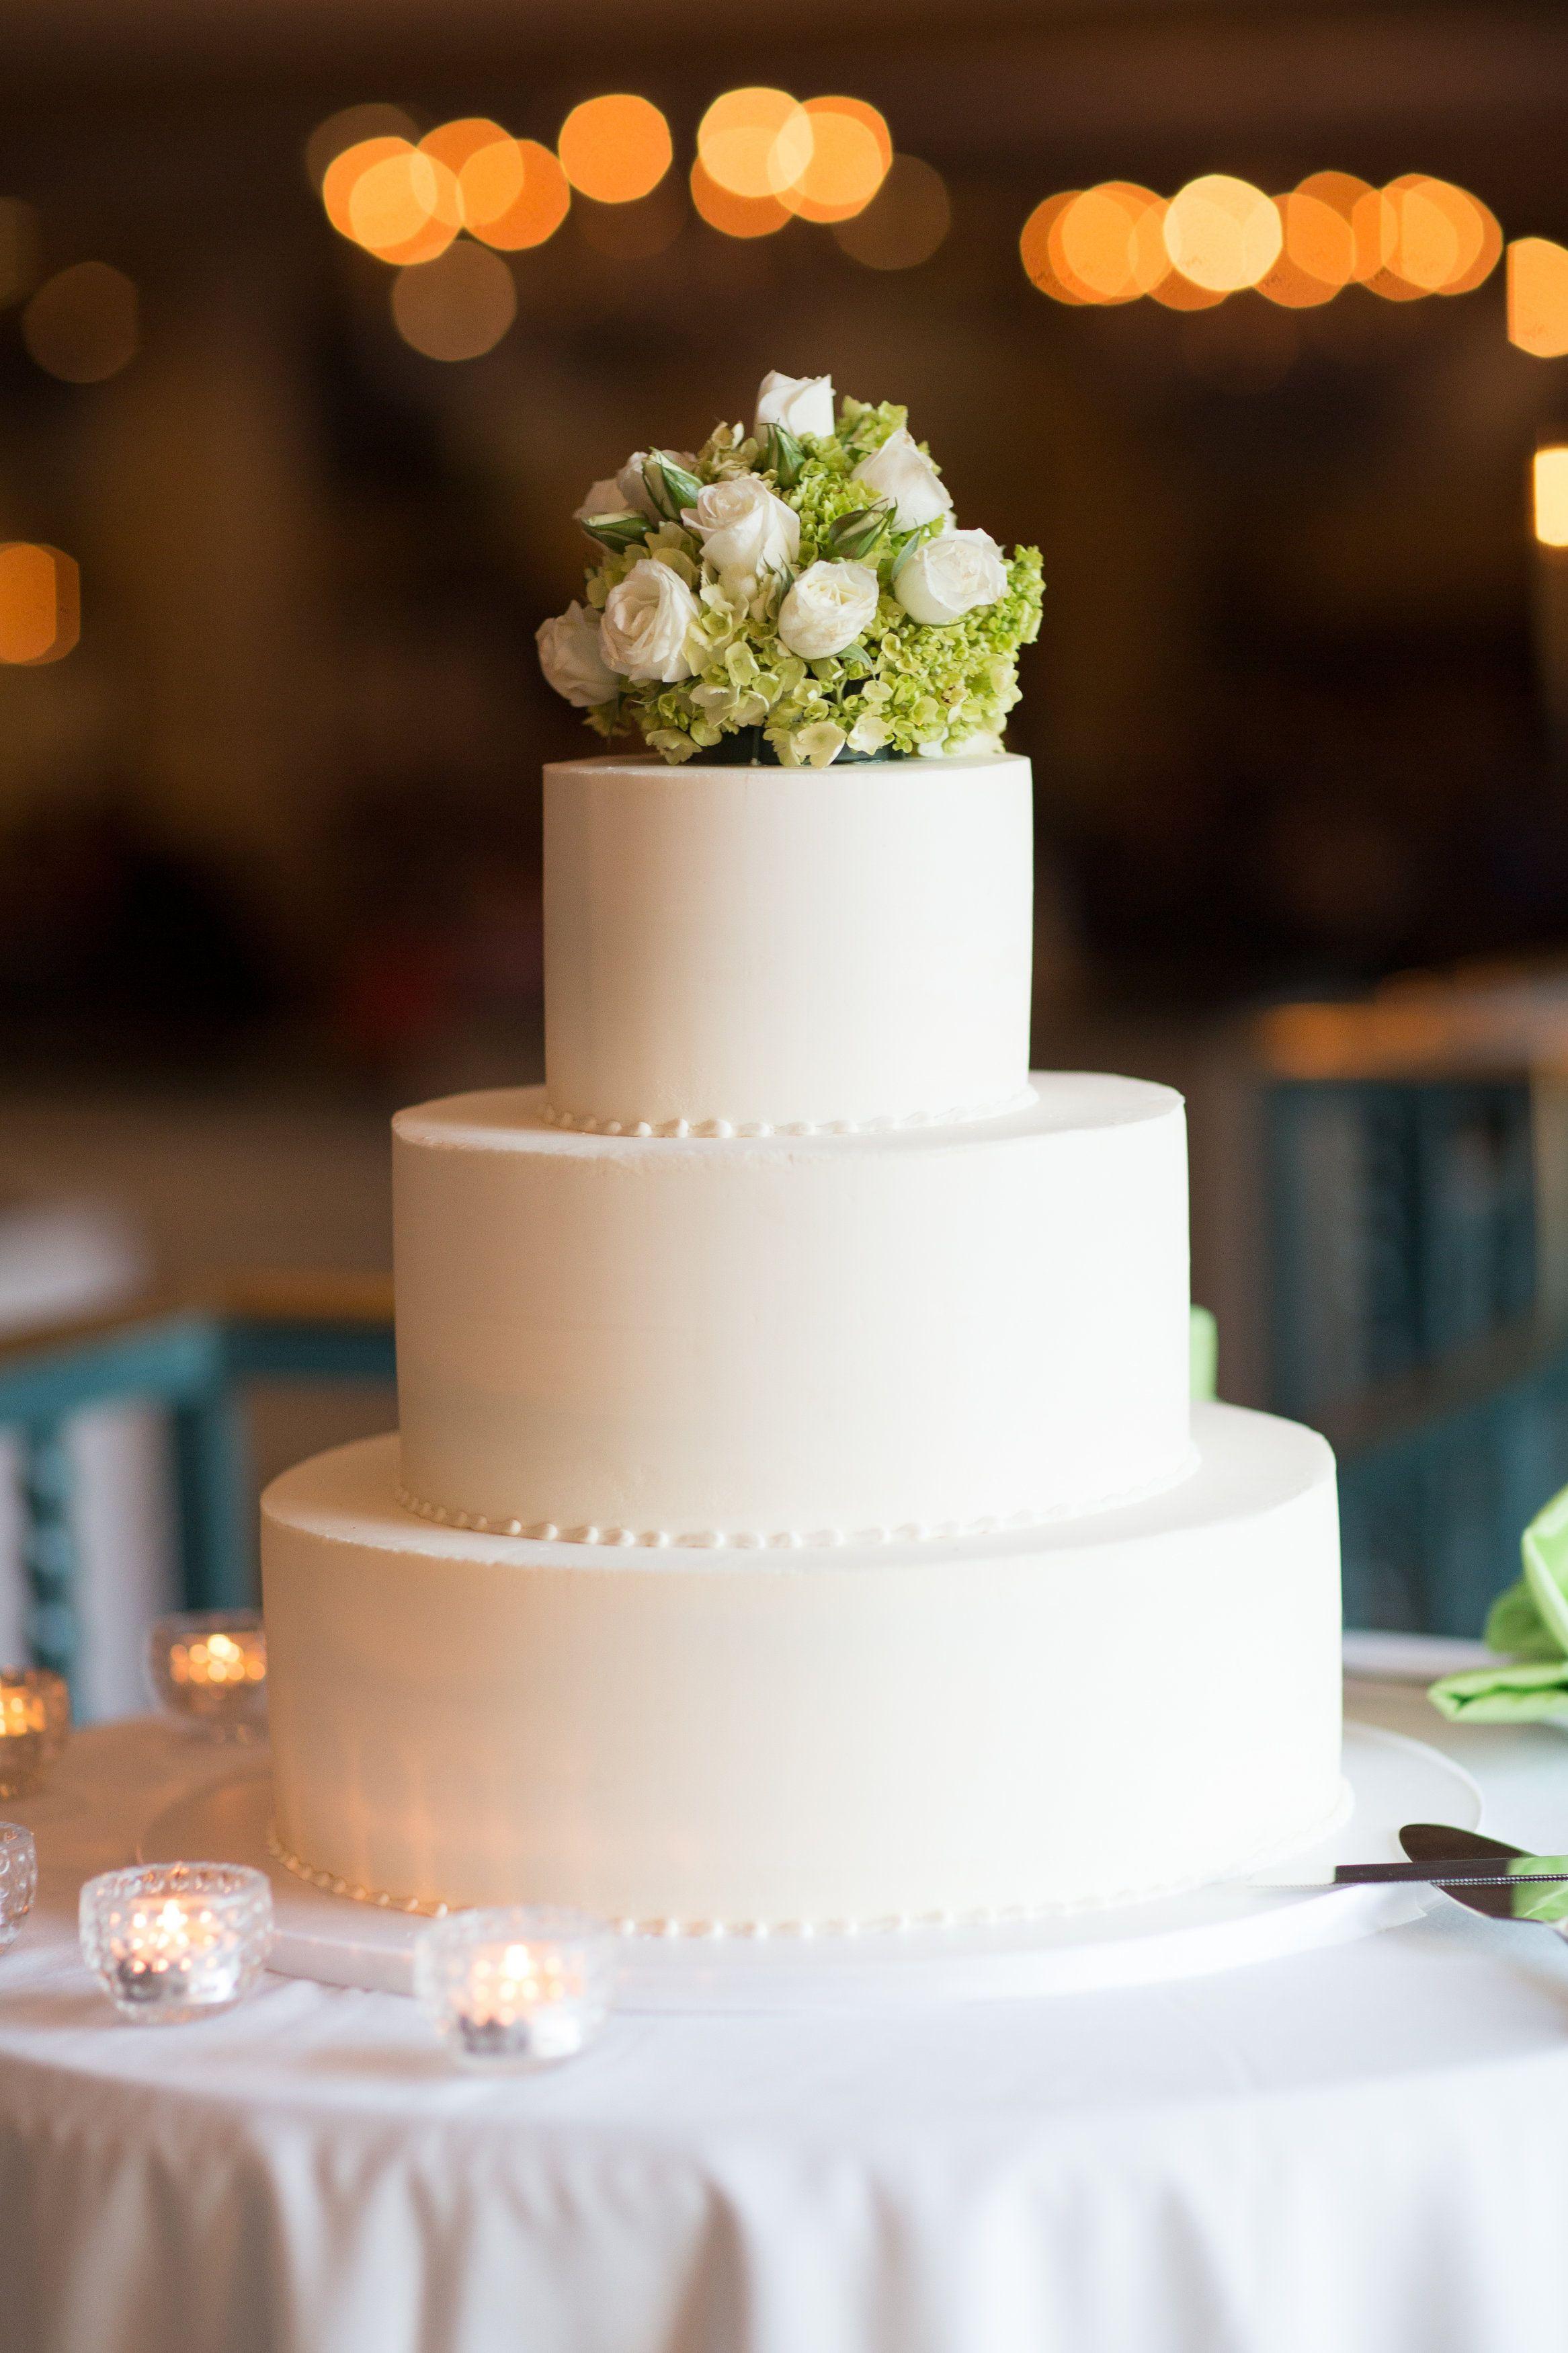 wedding cakes in lagunbeach ca%0A Simple white wedding cake  White butter cream wedding cake  Lime green  floral topper